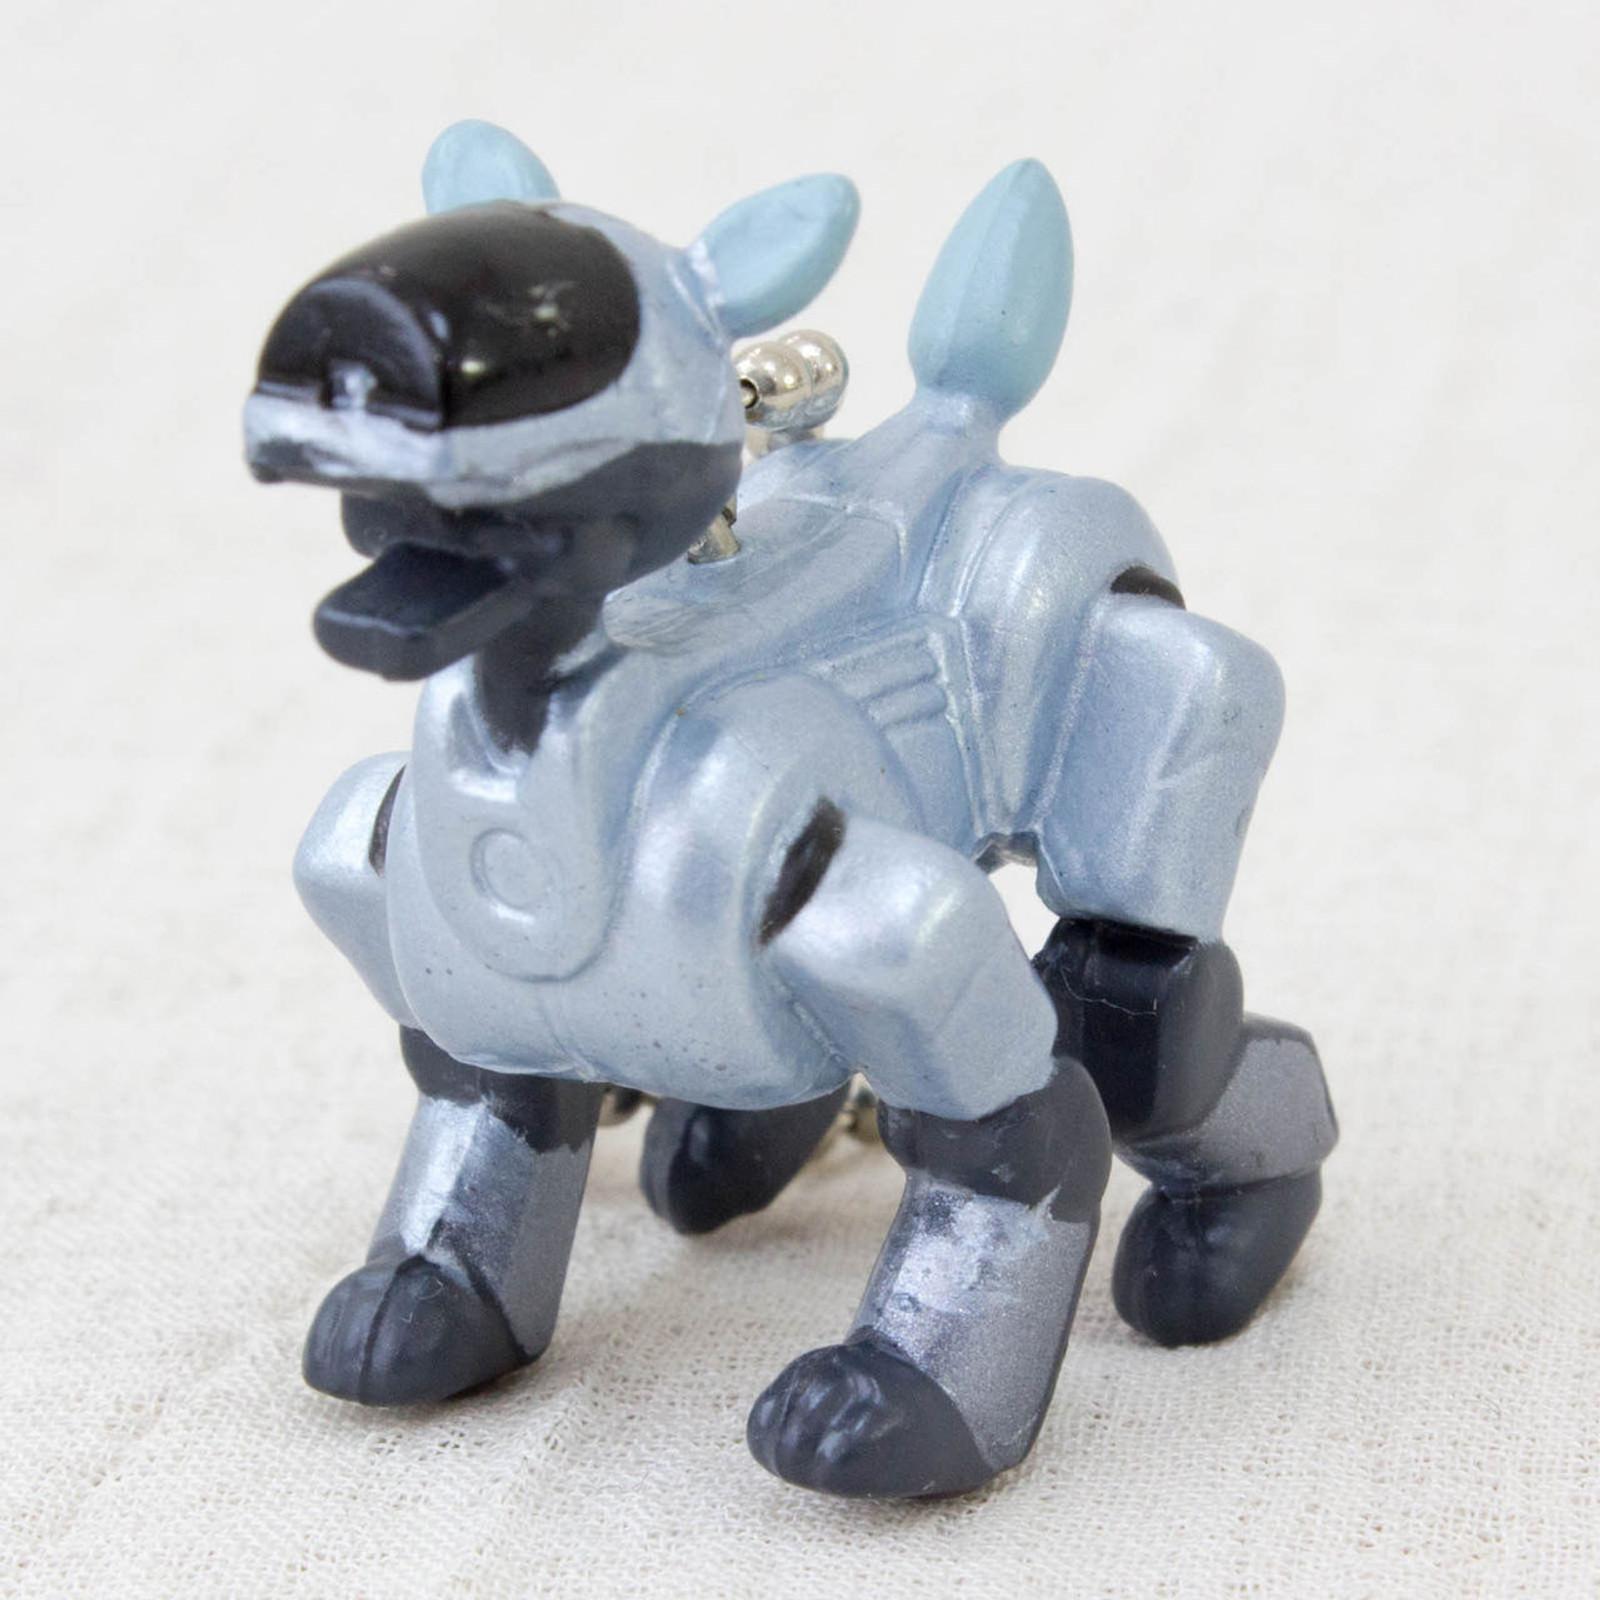 RARE!! AIBO ERS-210 Petit Figure Keychain JAPAN SONY